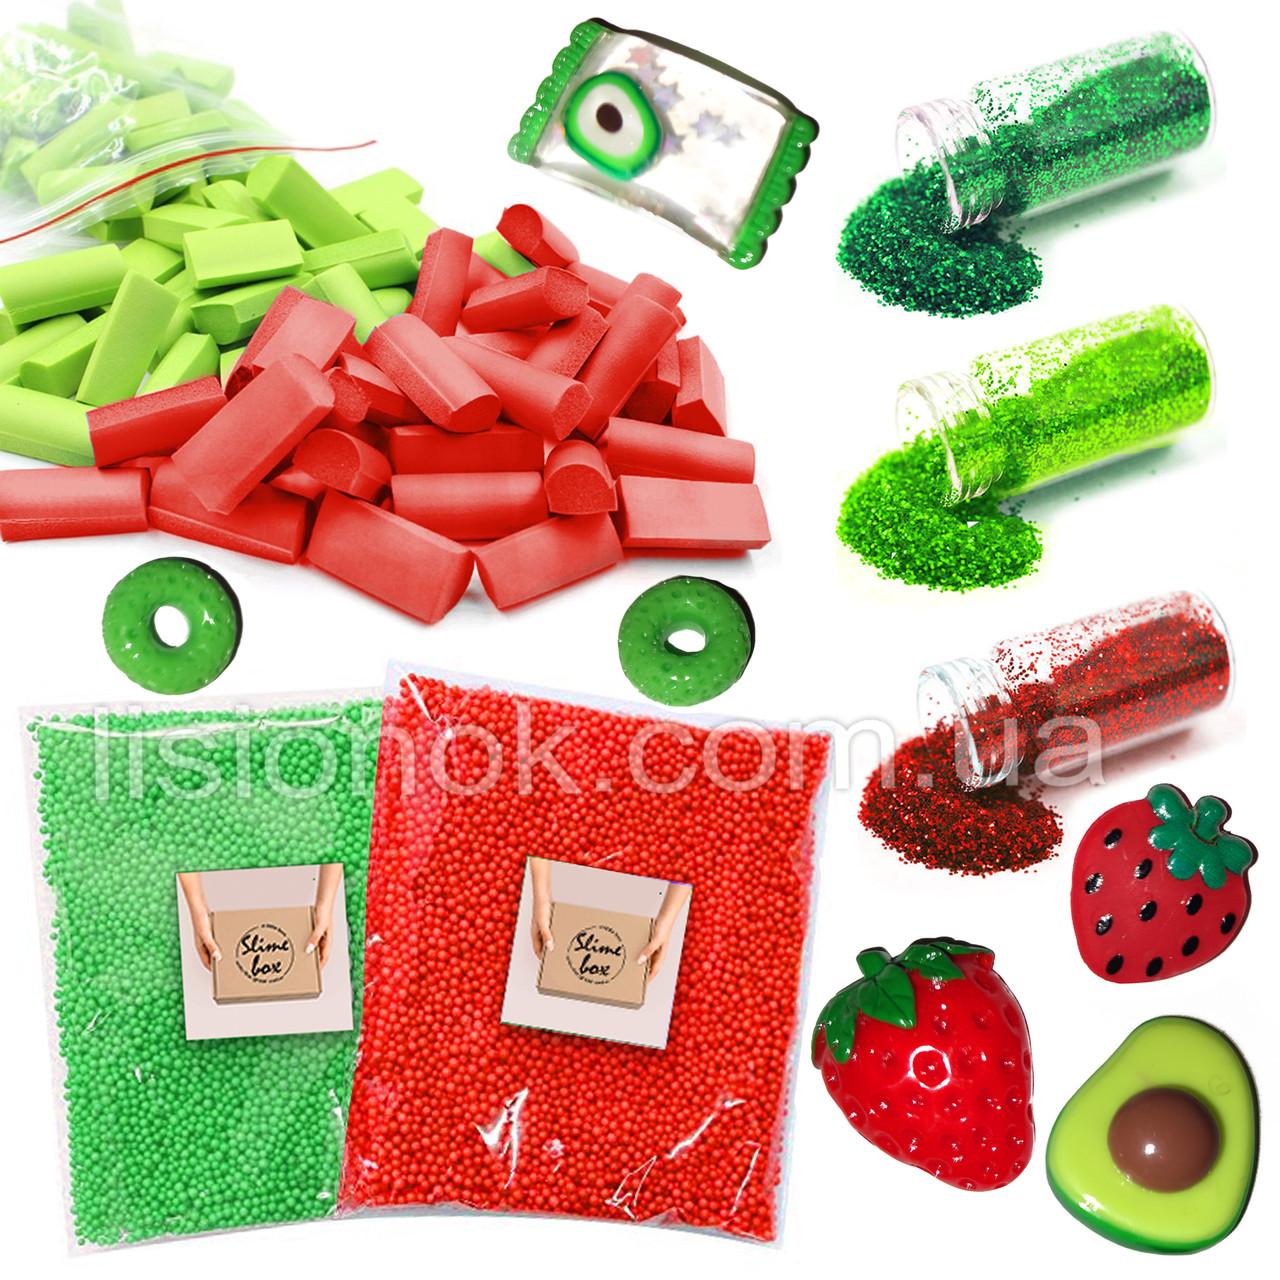 "Slime box ""Клубника и Авокадо"" набор добавок для слайма: шармики, пенопласт, фоам чанкс, глиттер, баночки"